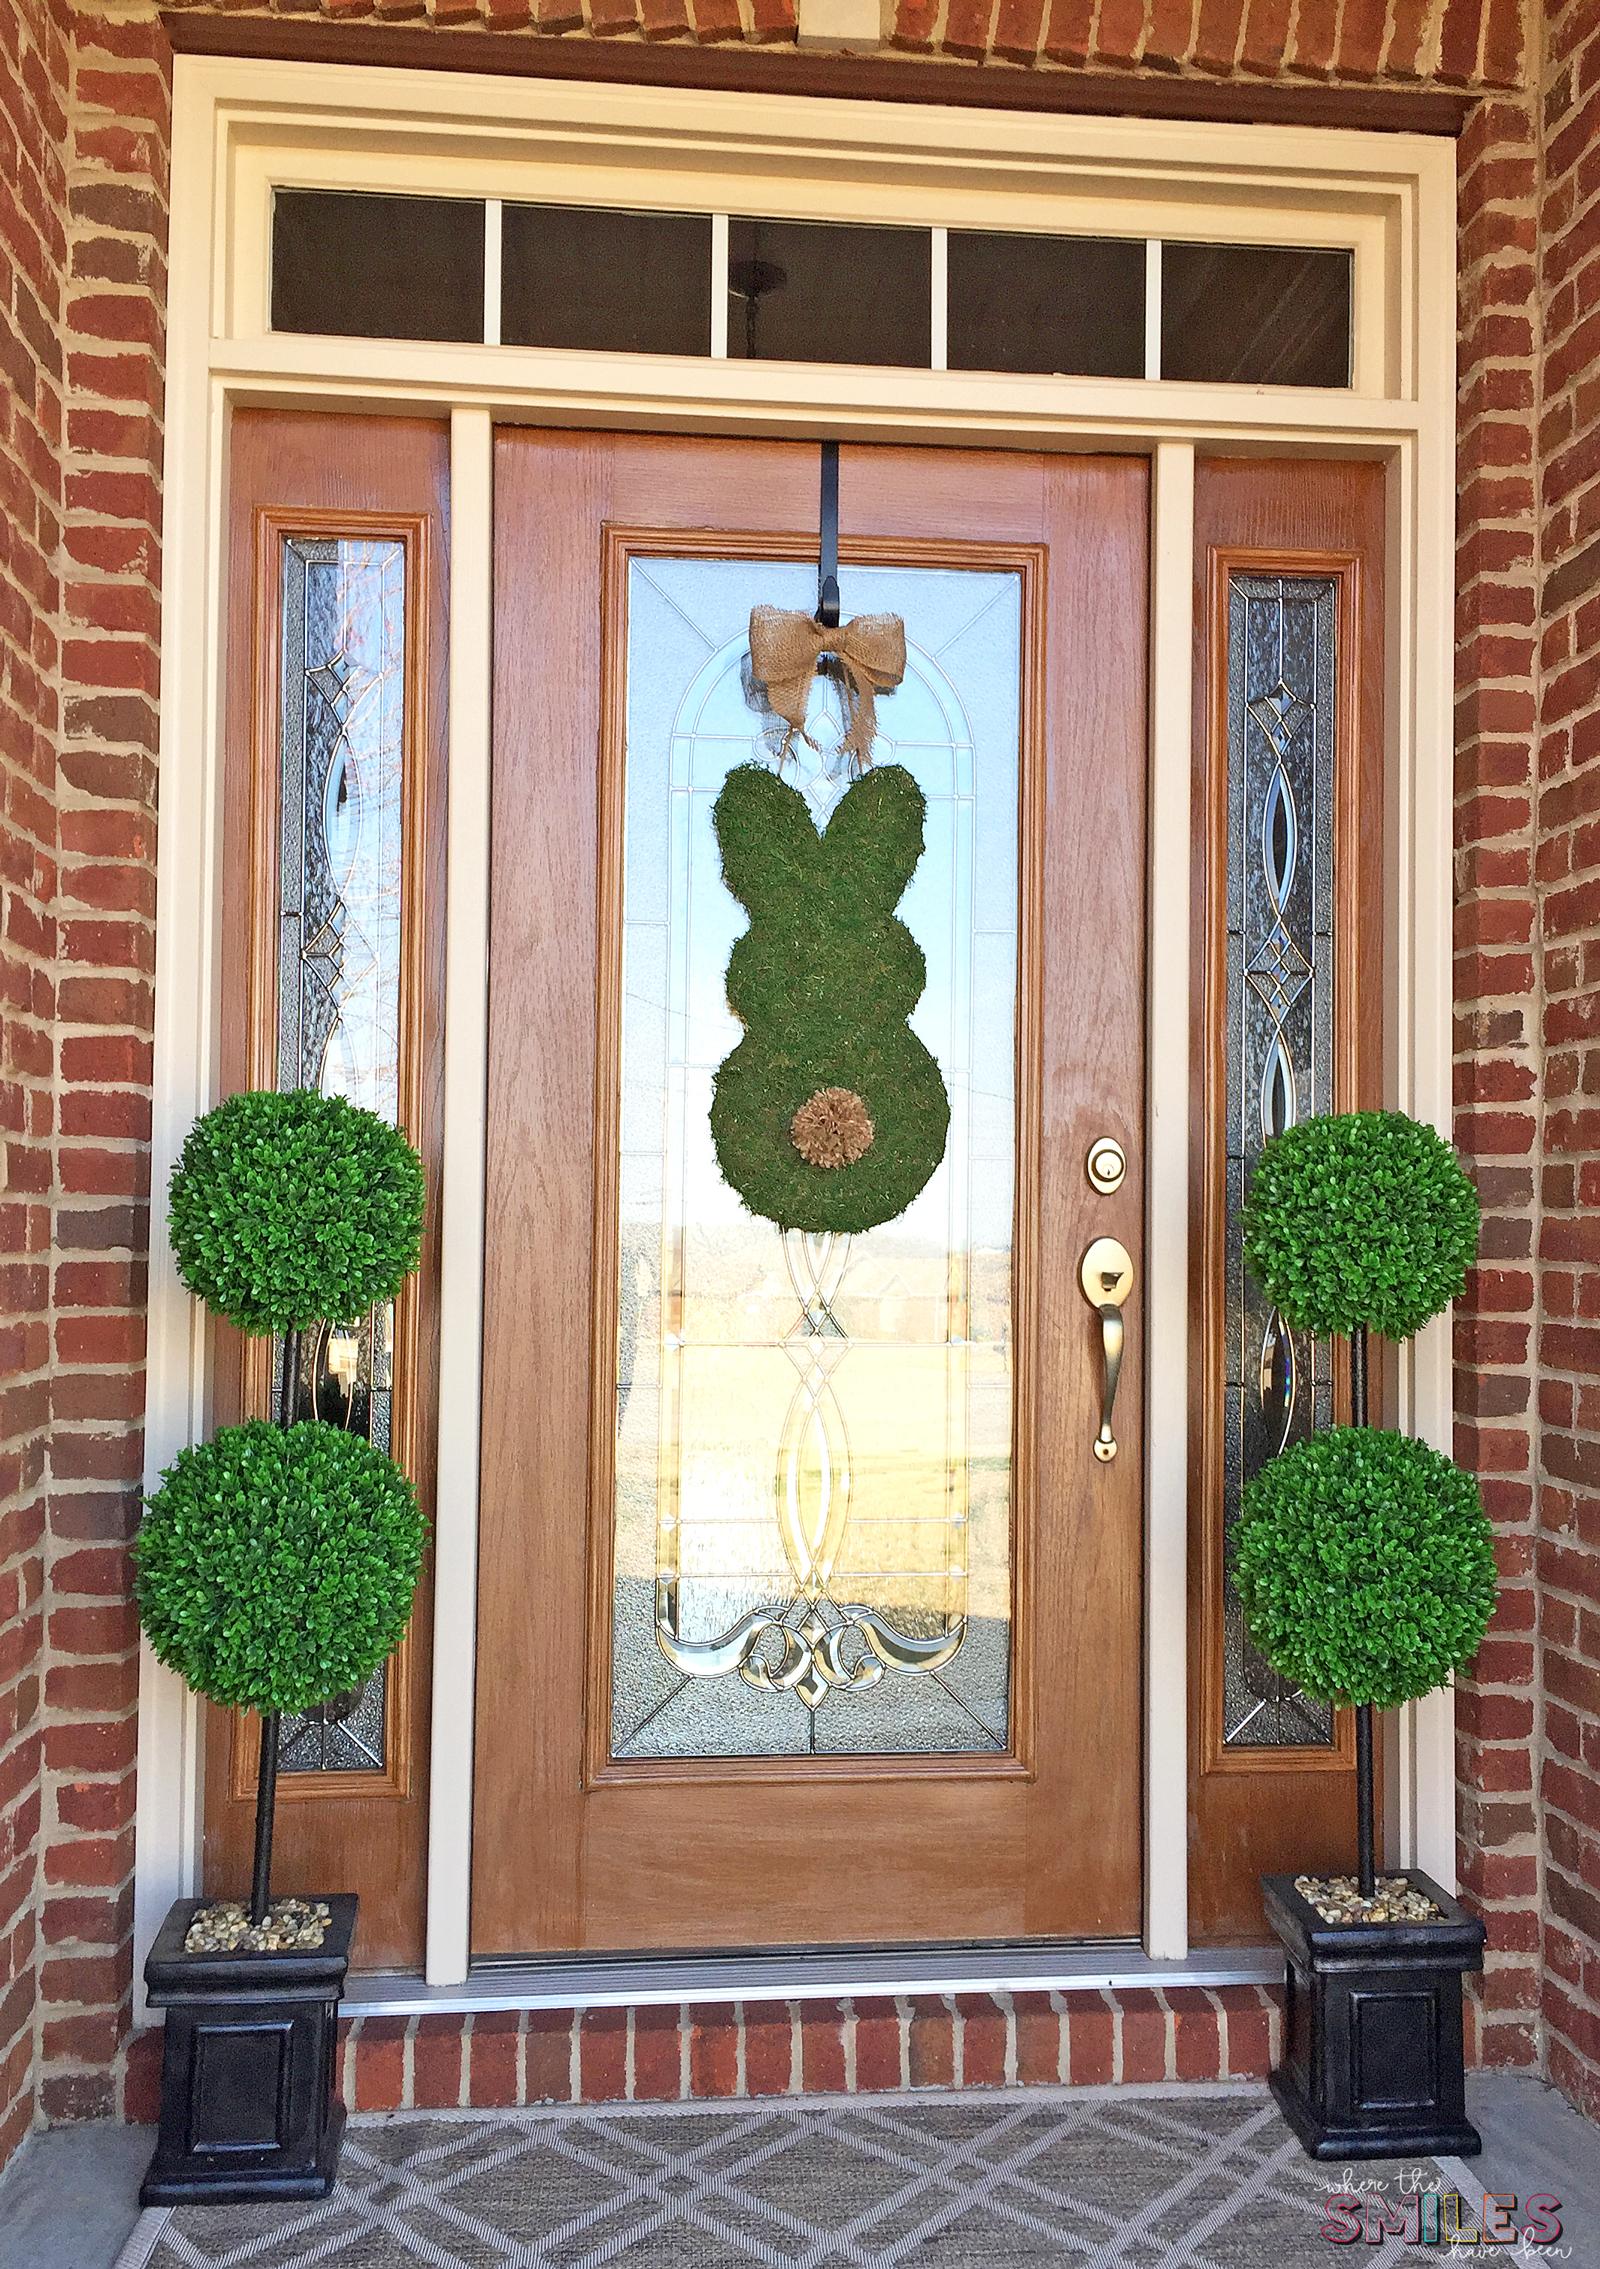 Simple Moss Covered Bunny Door Hanger for Spring